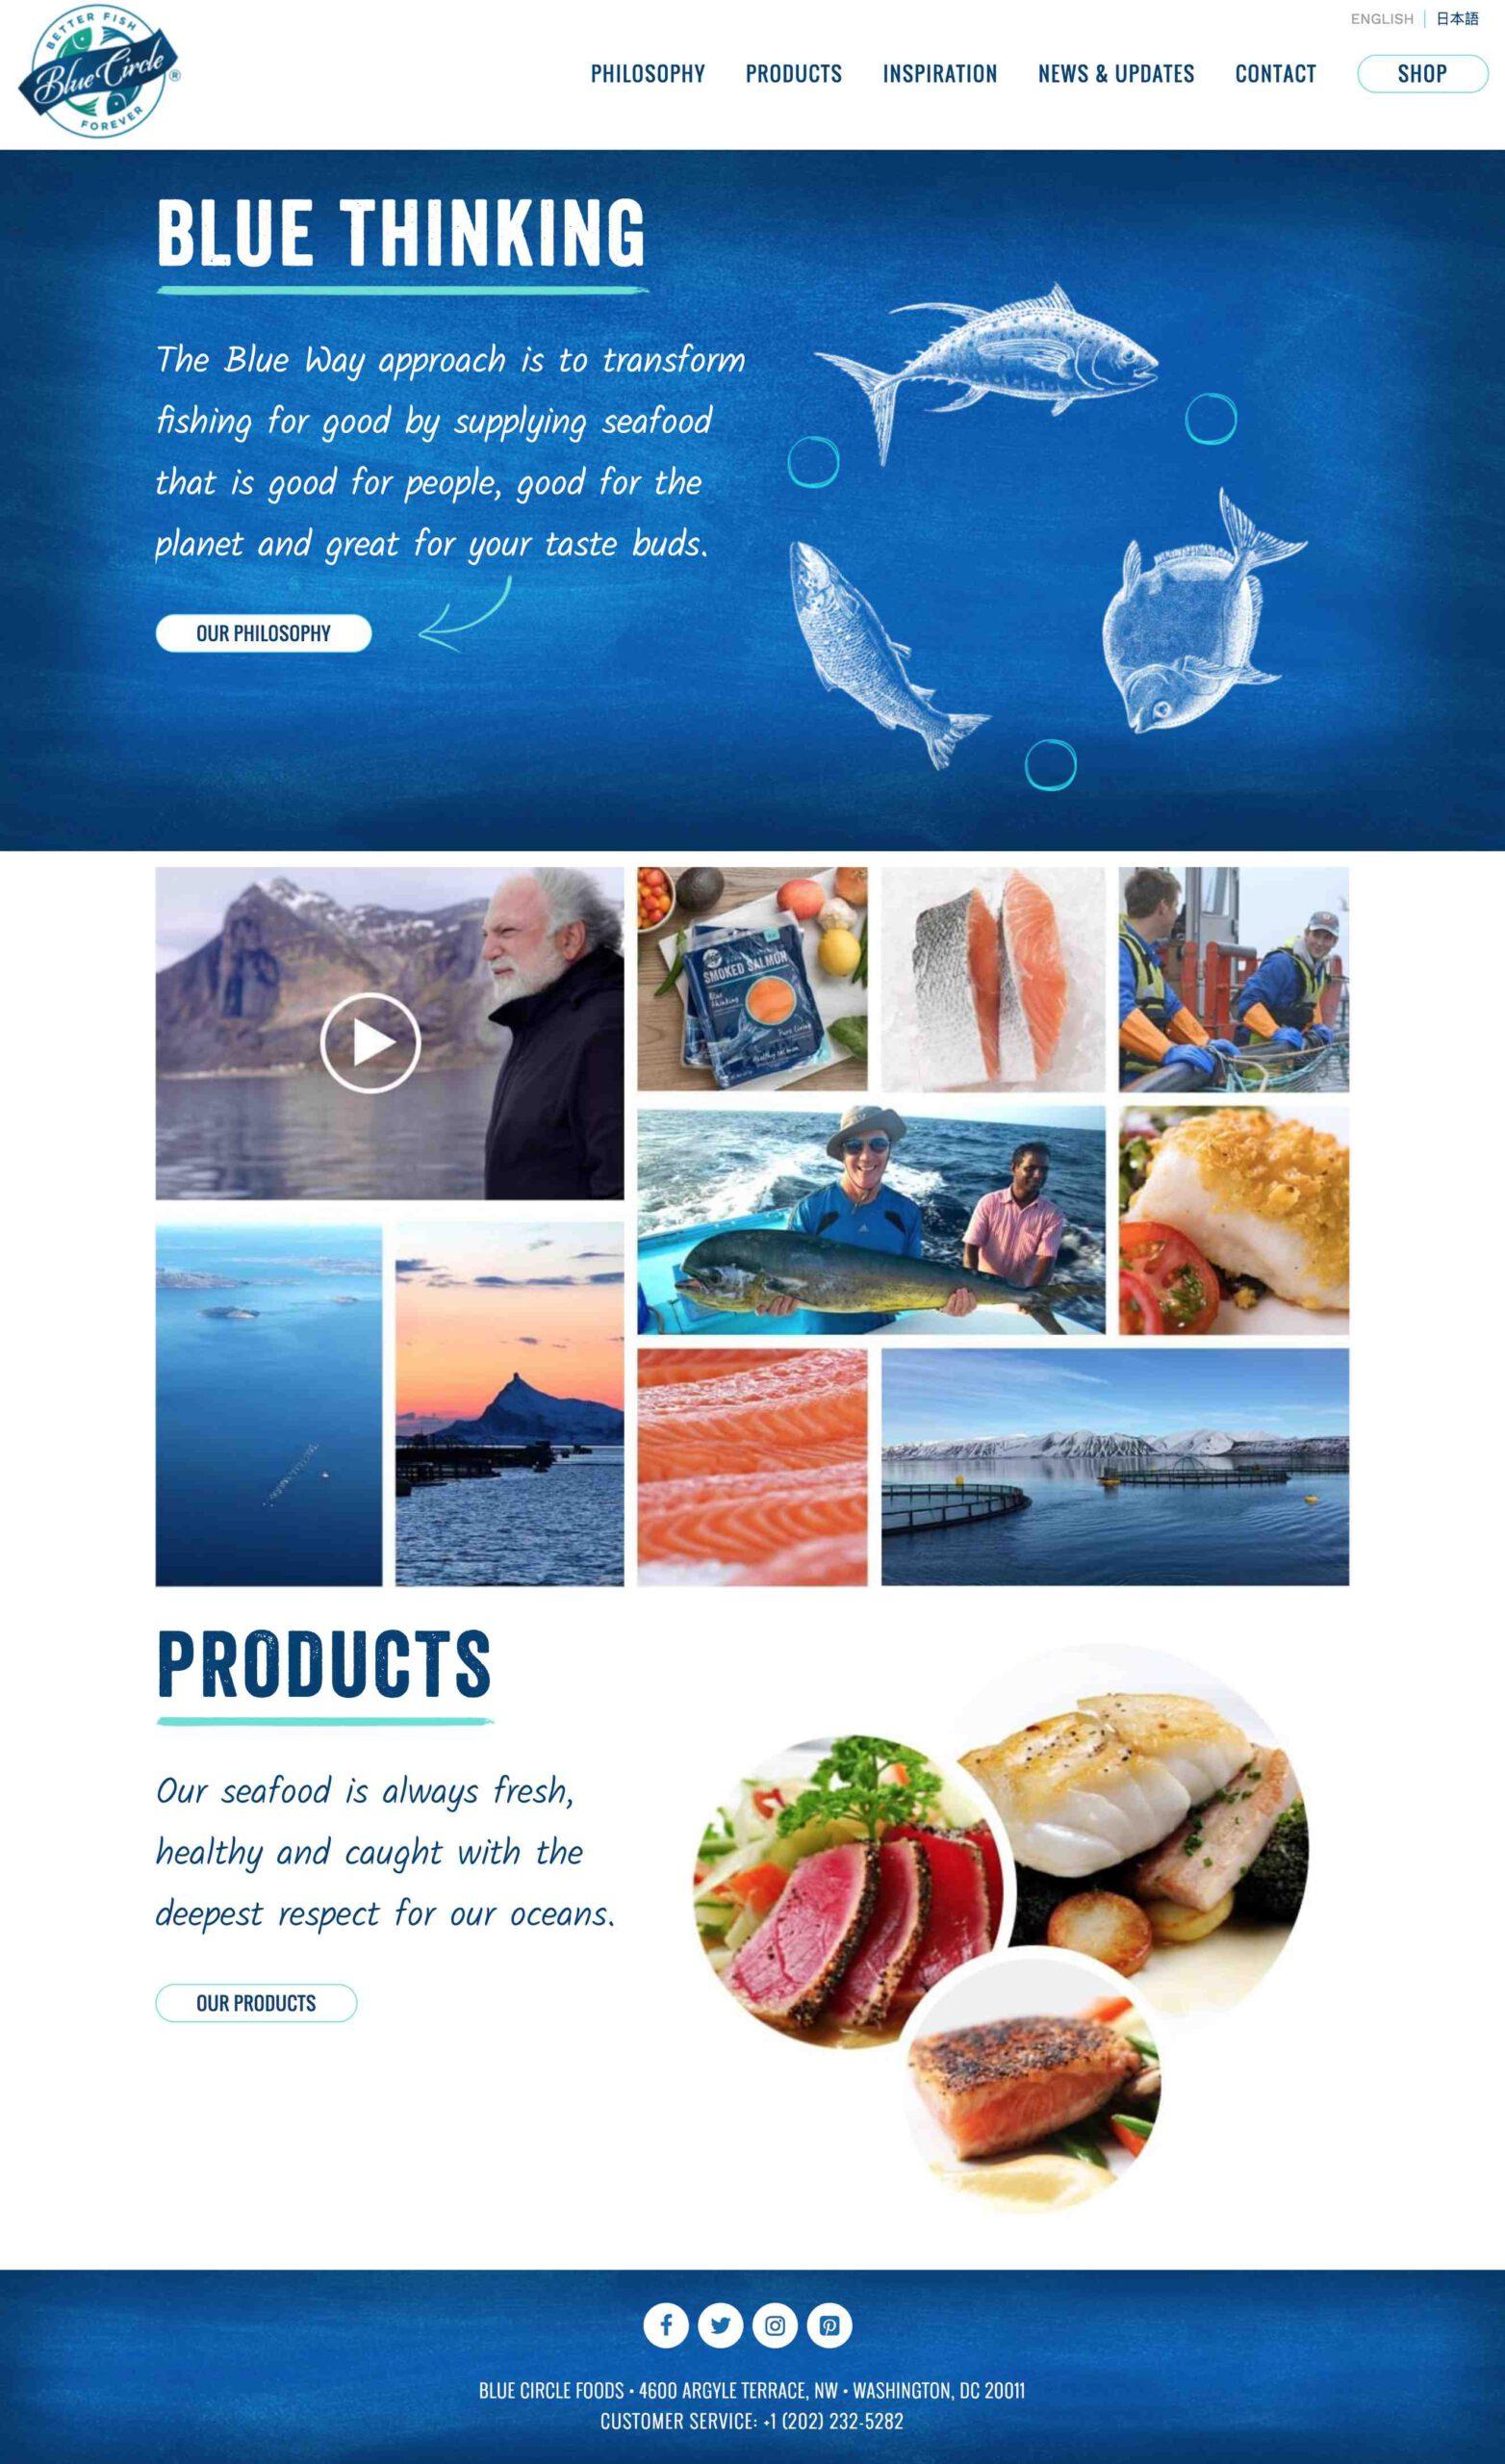 Blue Circle Foods website redesign